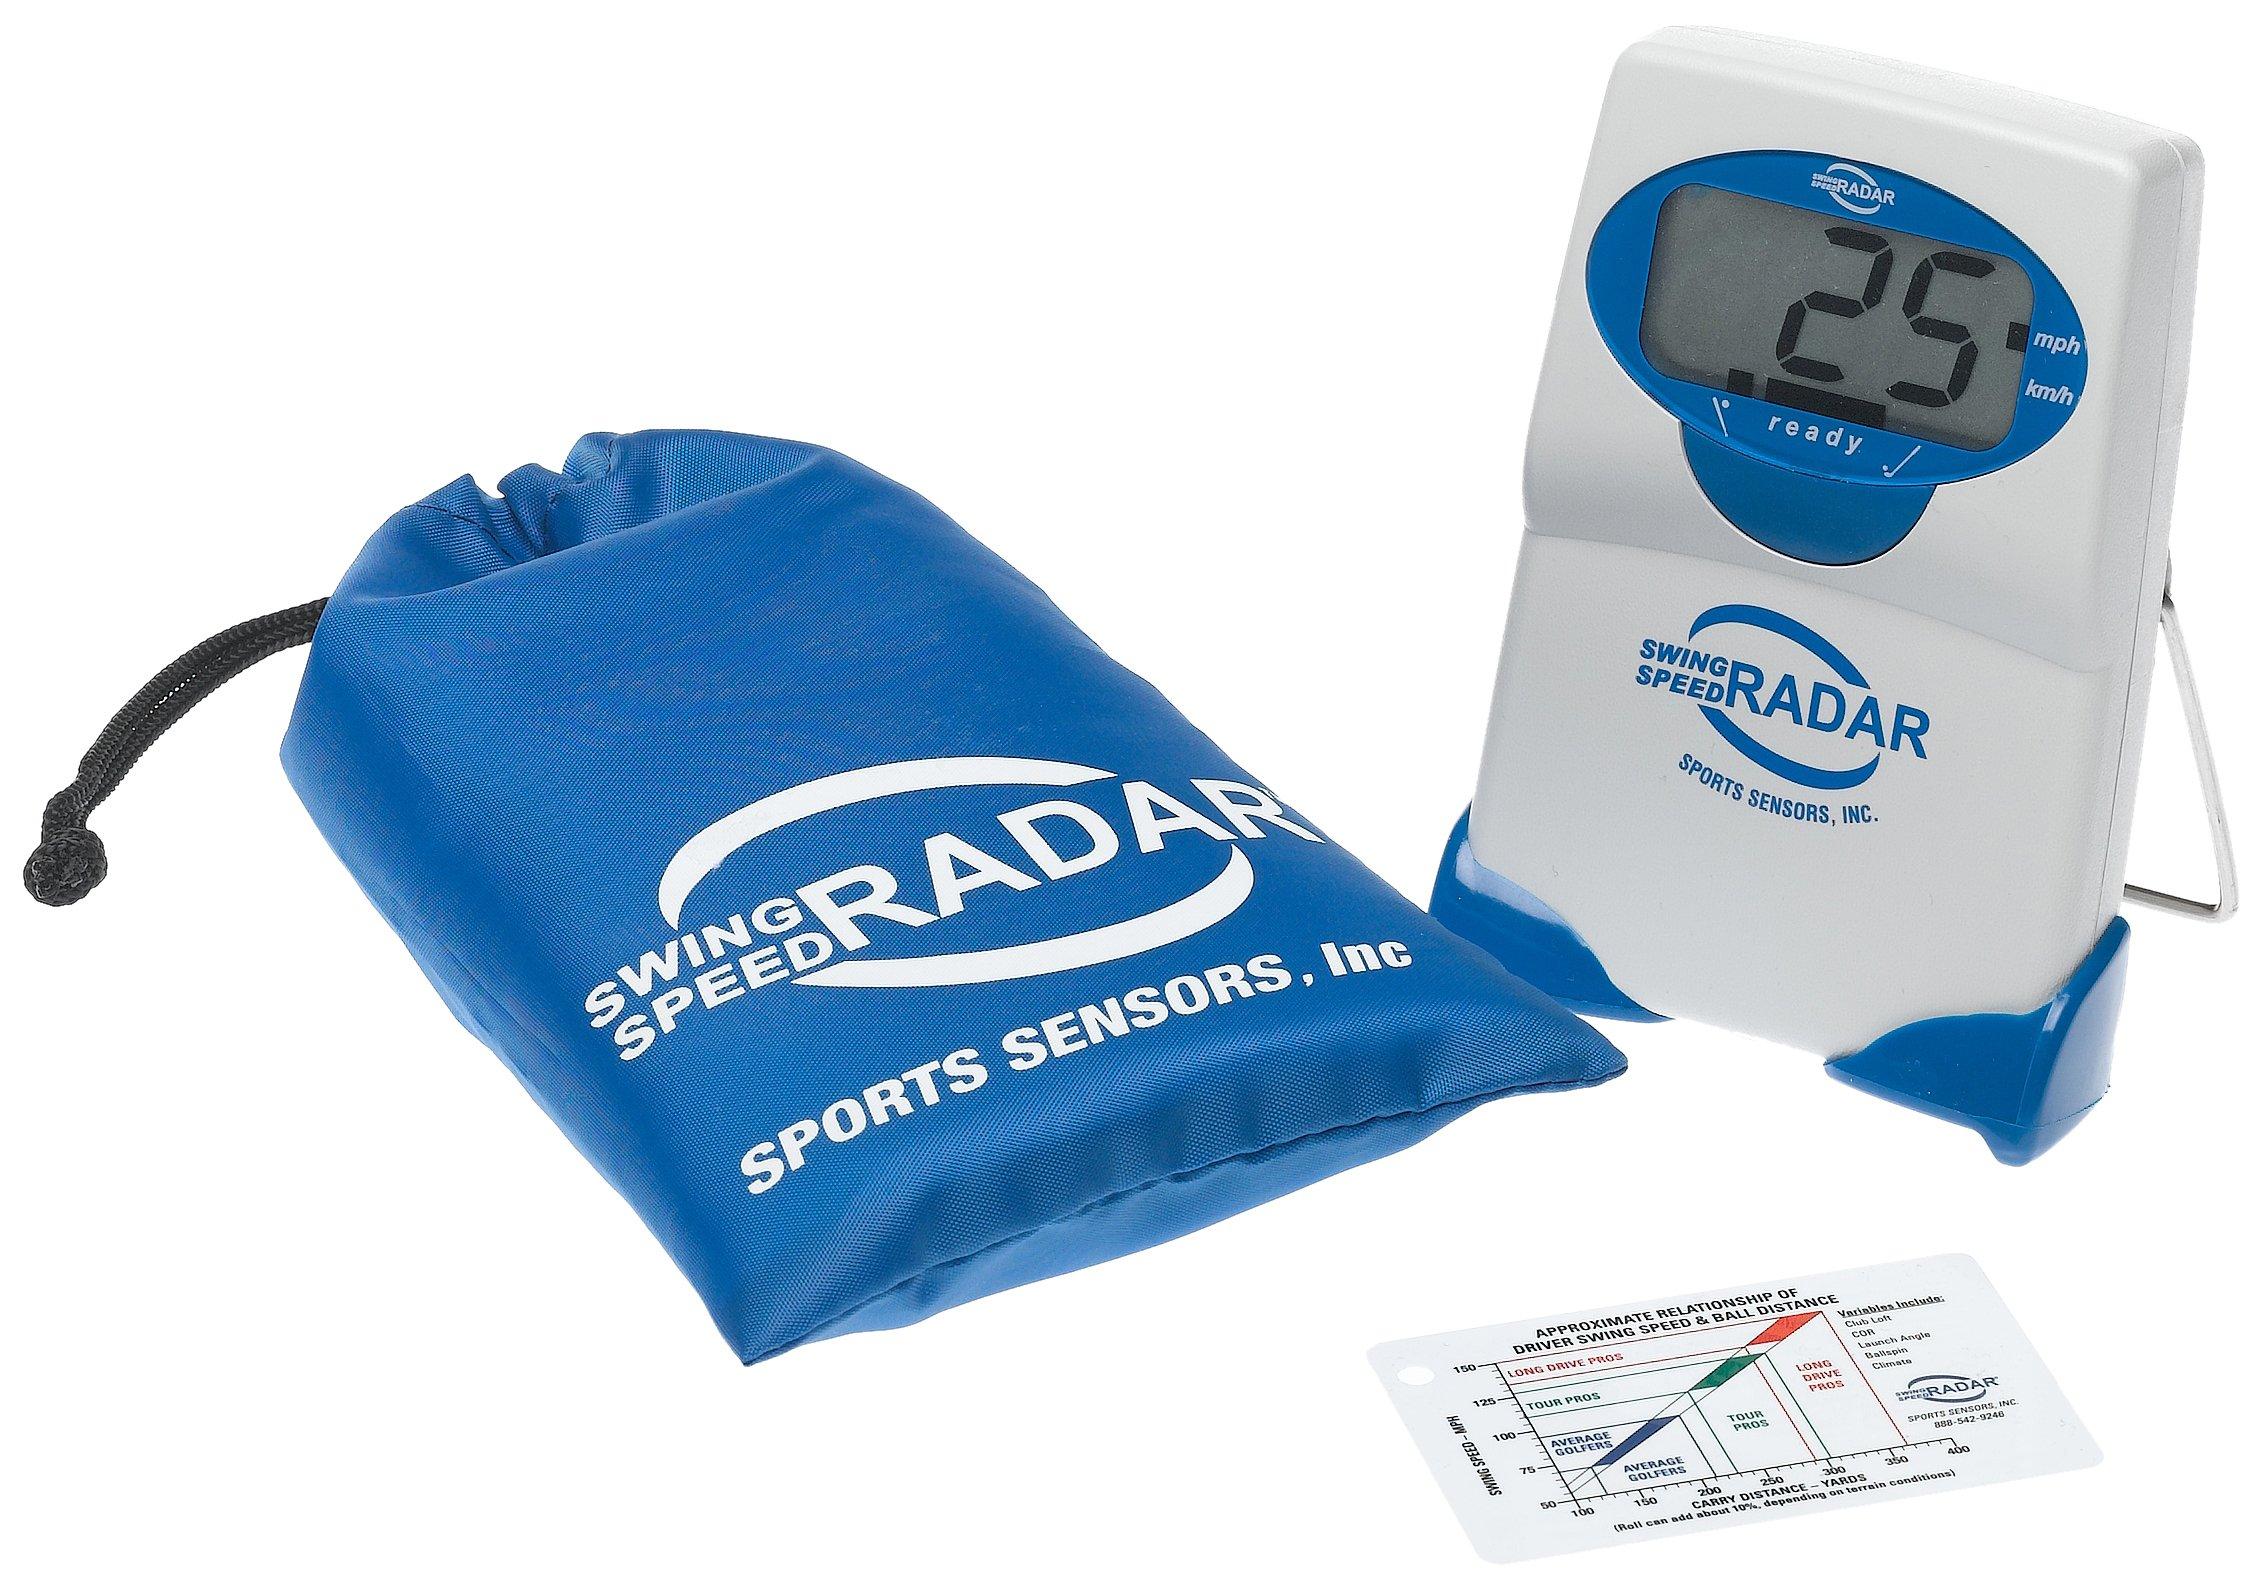 Sports Sensors Swing Speed Radar by Sports Sensors, Inc